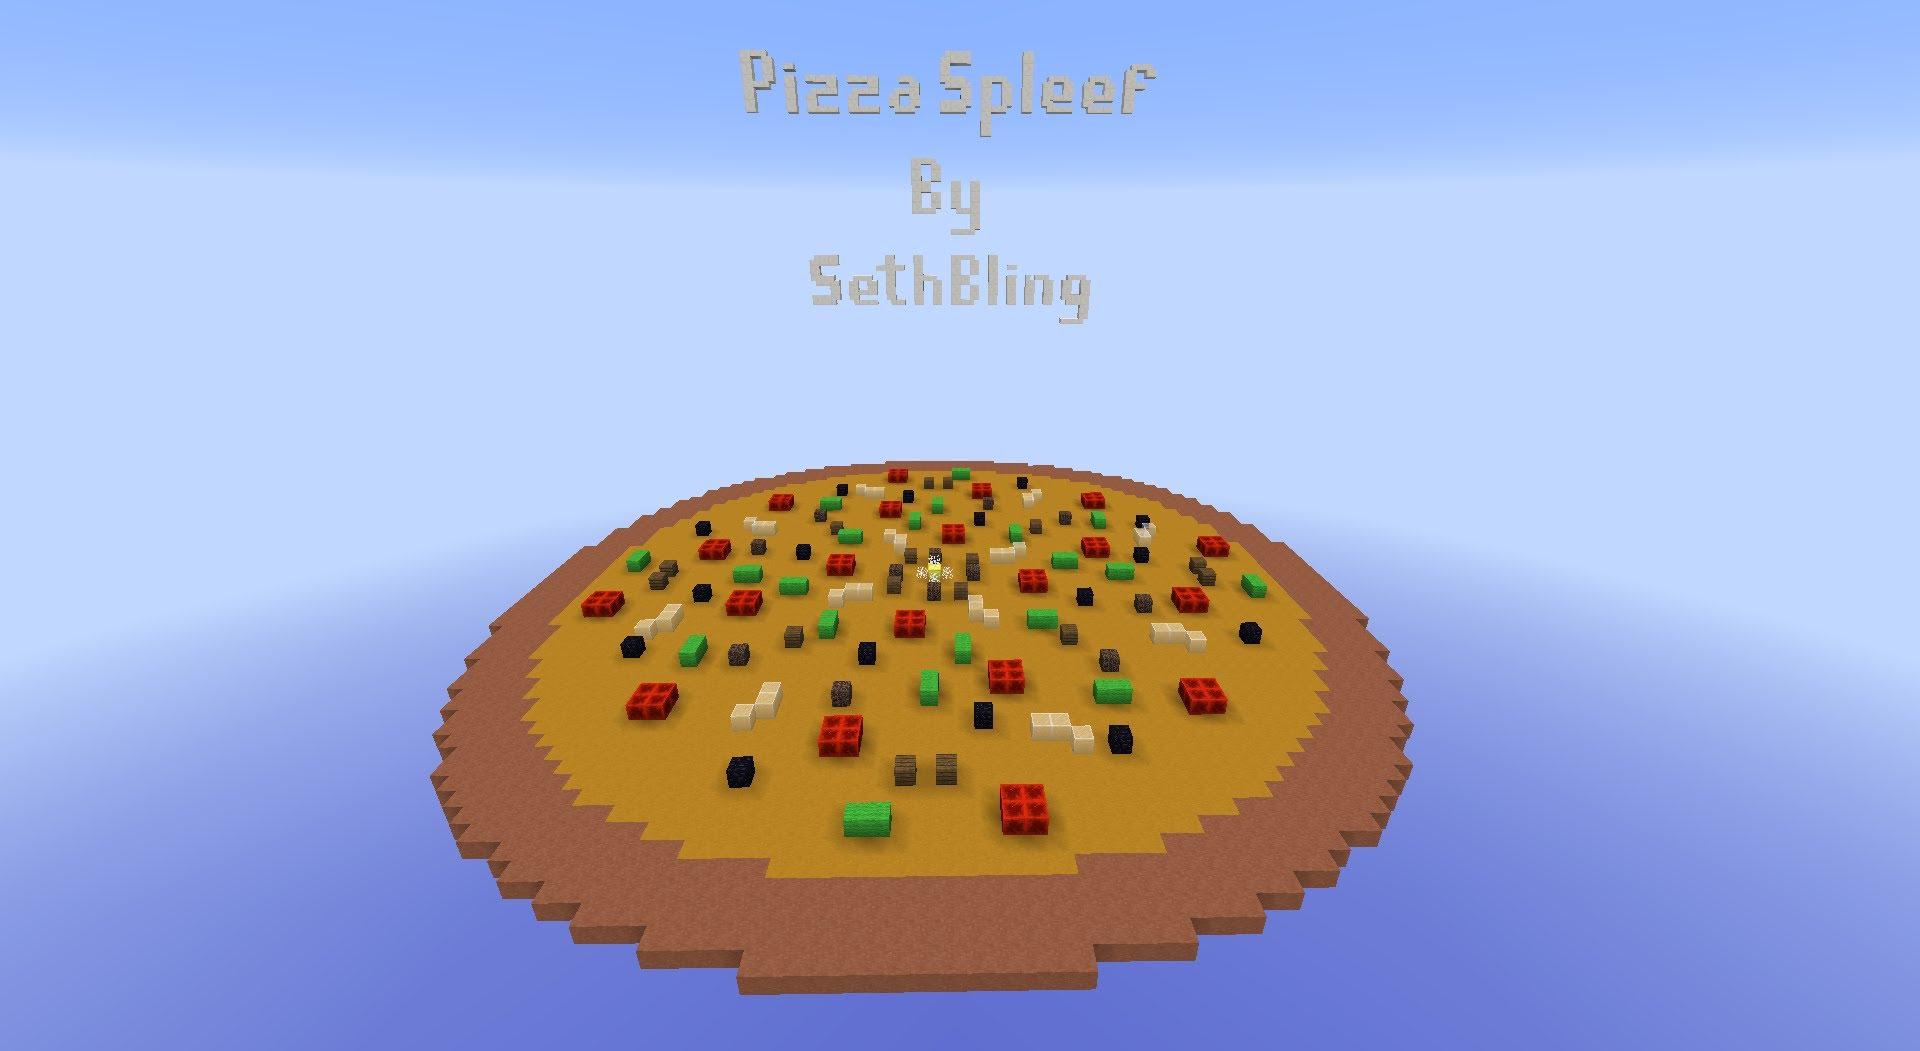 Pizza-Spleef-Minigame-Map-1.jpg